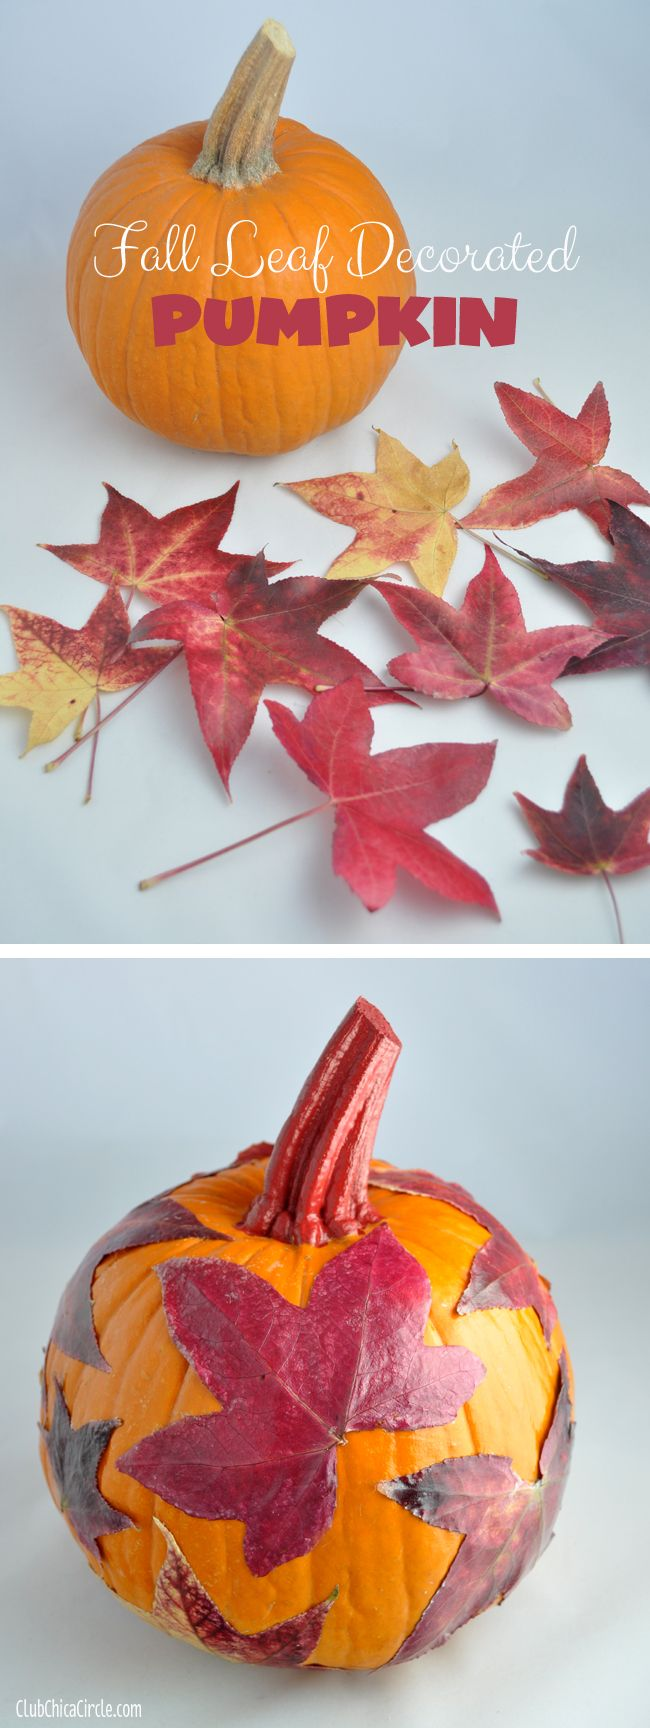 Fall Leaf Decorated Pumpkin craft idea with